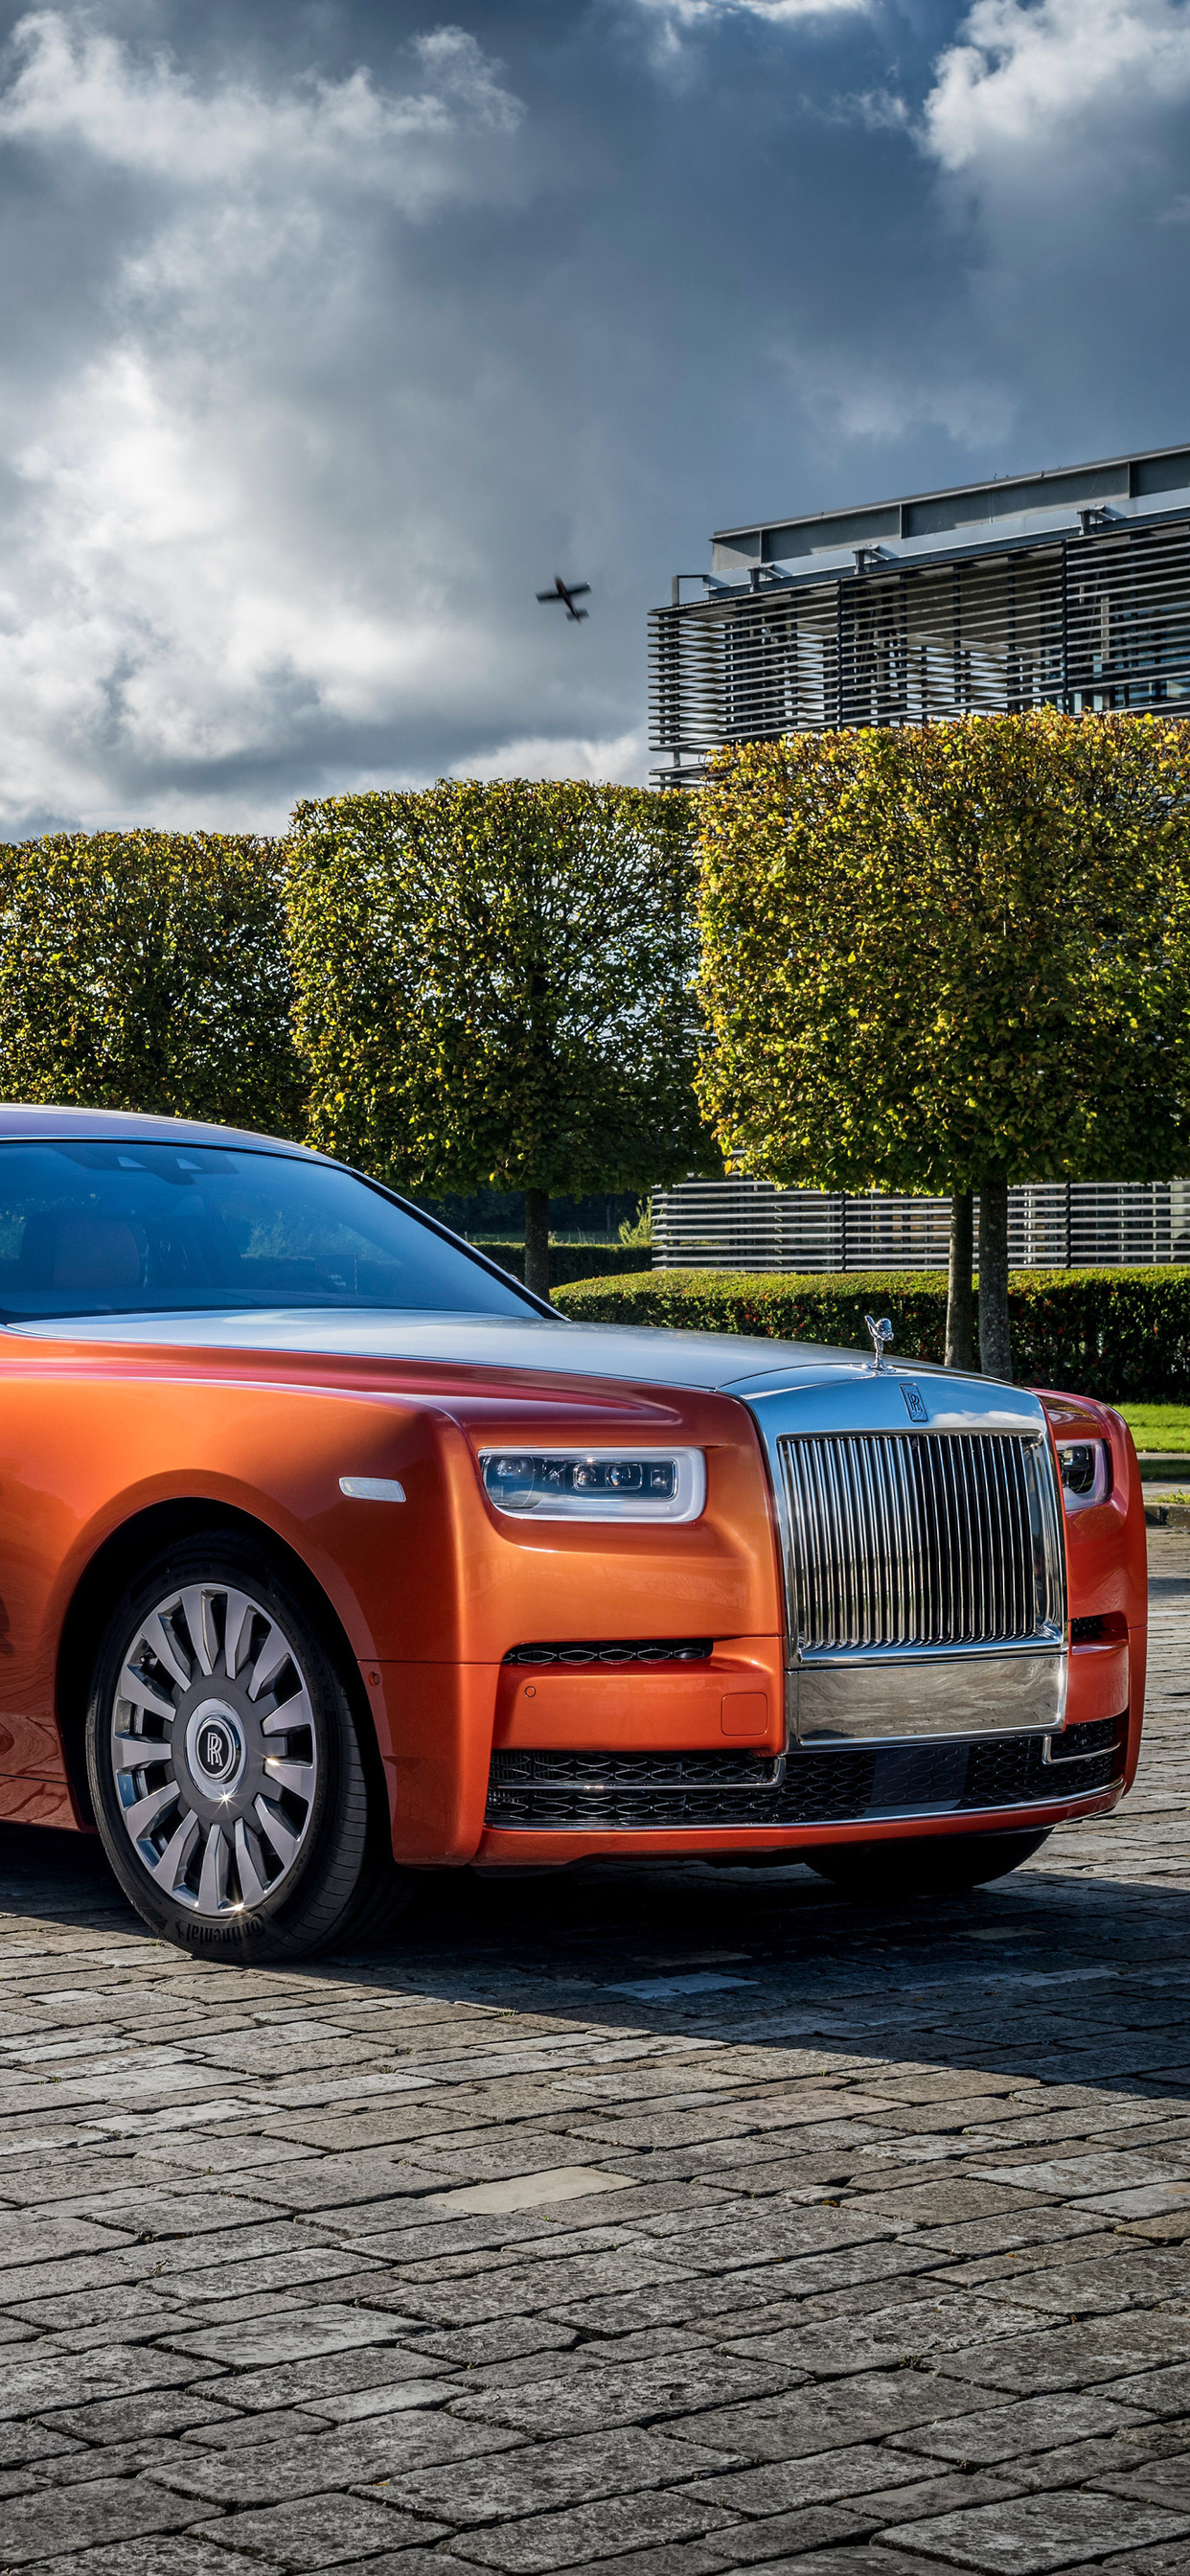 1242x2688 Rolls Royce Phantom Ewb 4k Iphone Xs Max Hd 4k Wallpapers